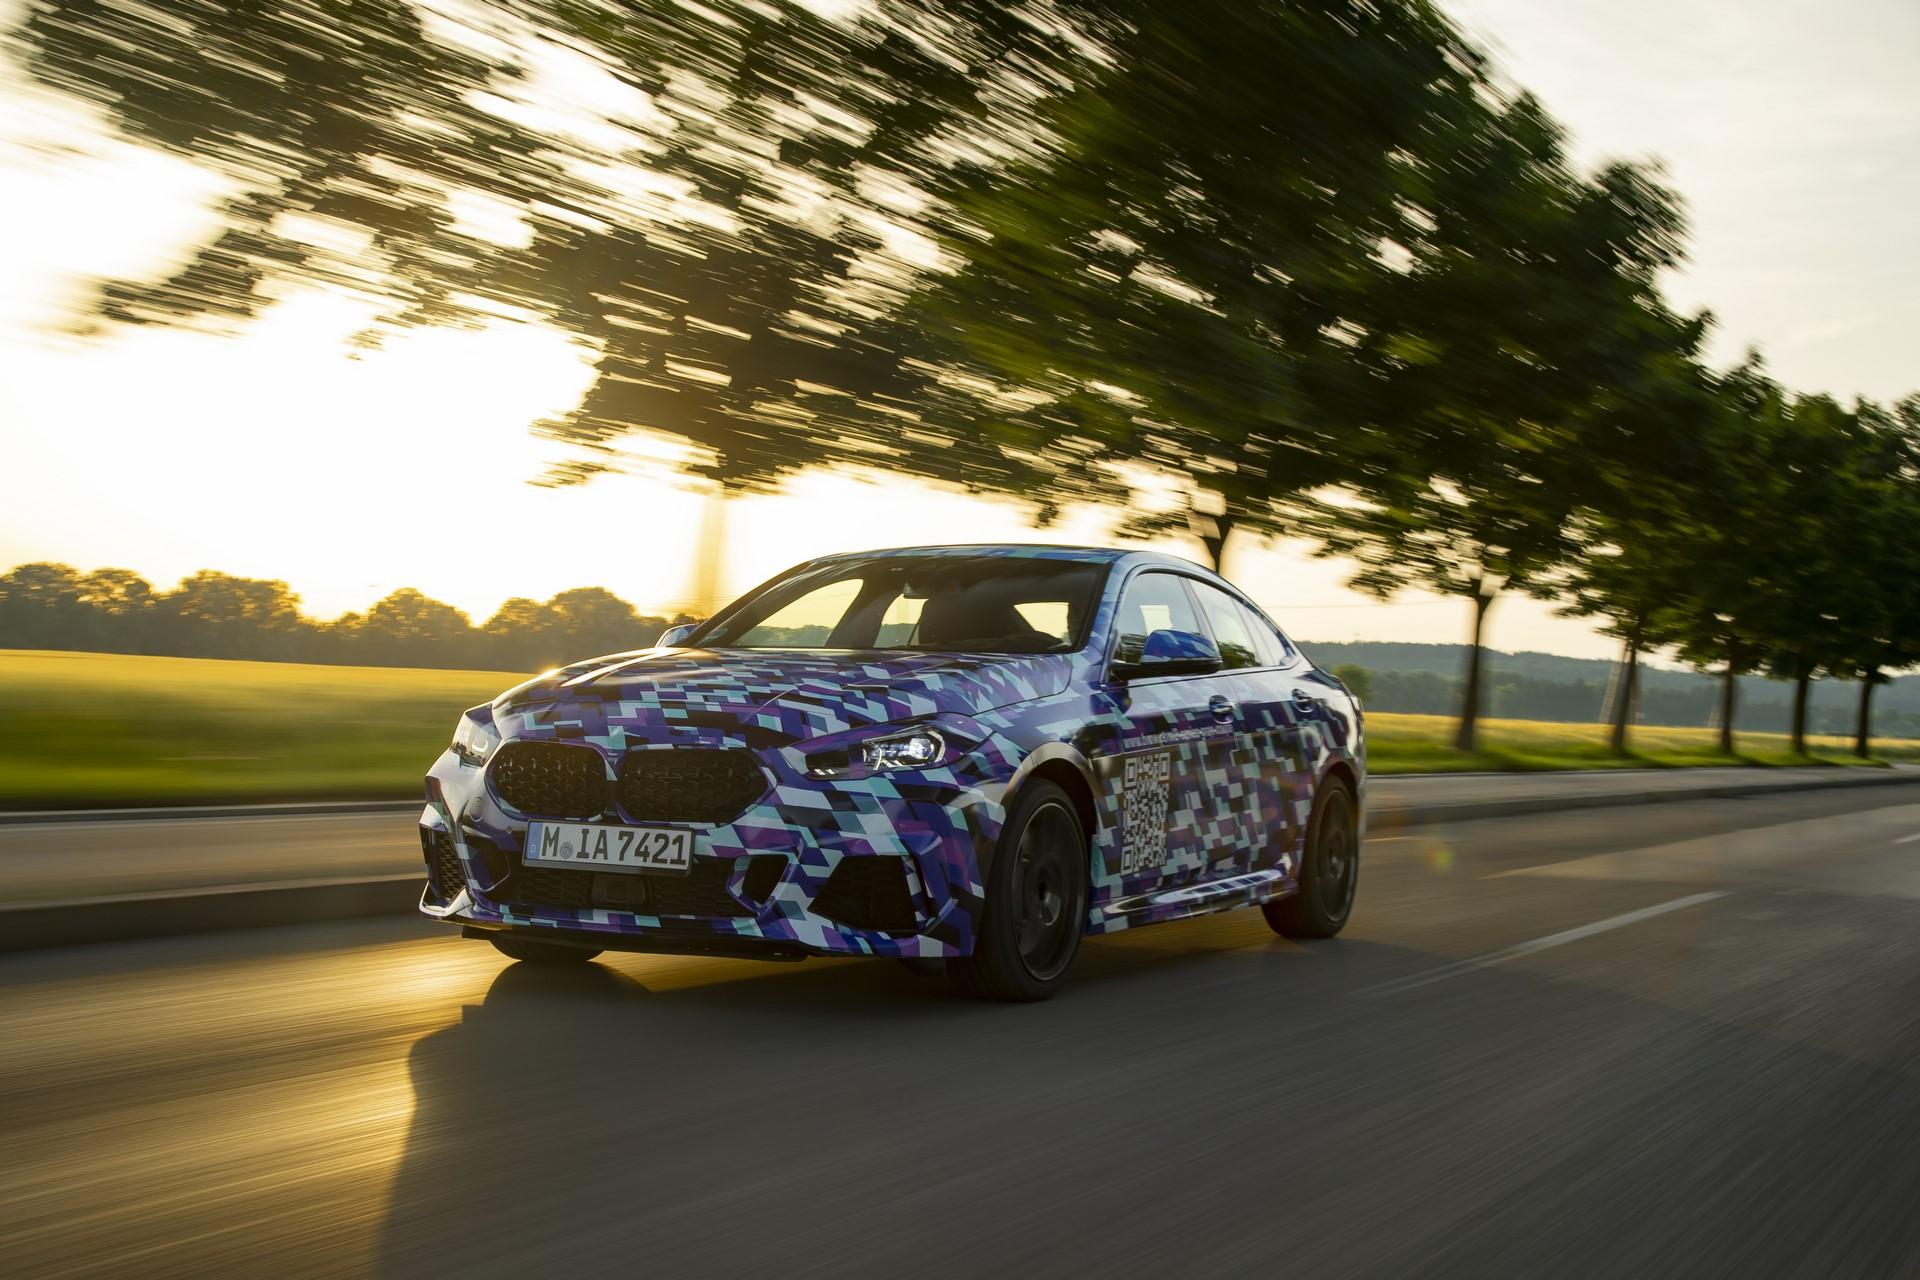 BMW-2-Series-Gran-Coupe-2020-spy-photos-35